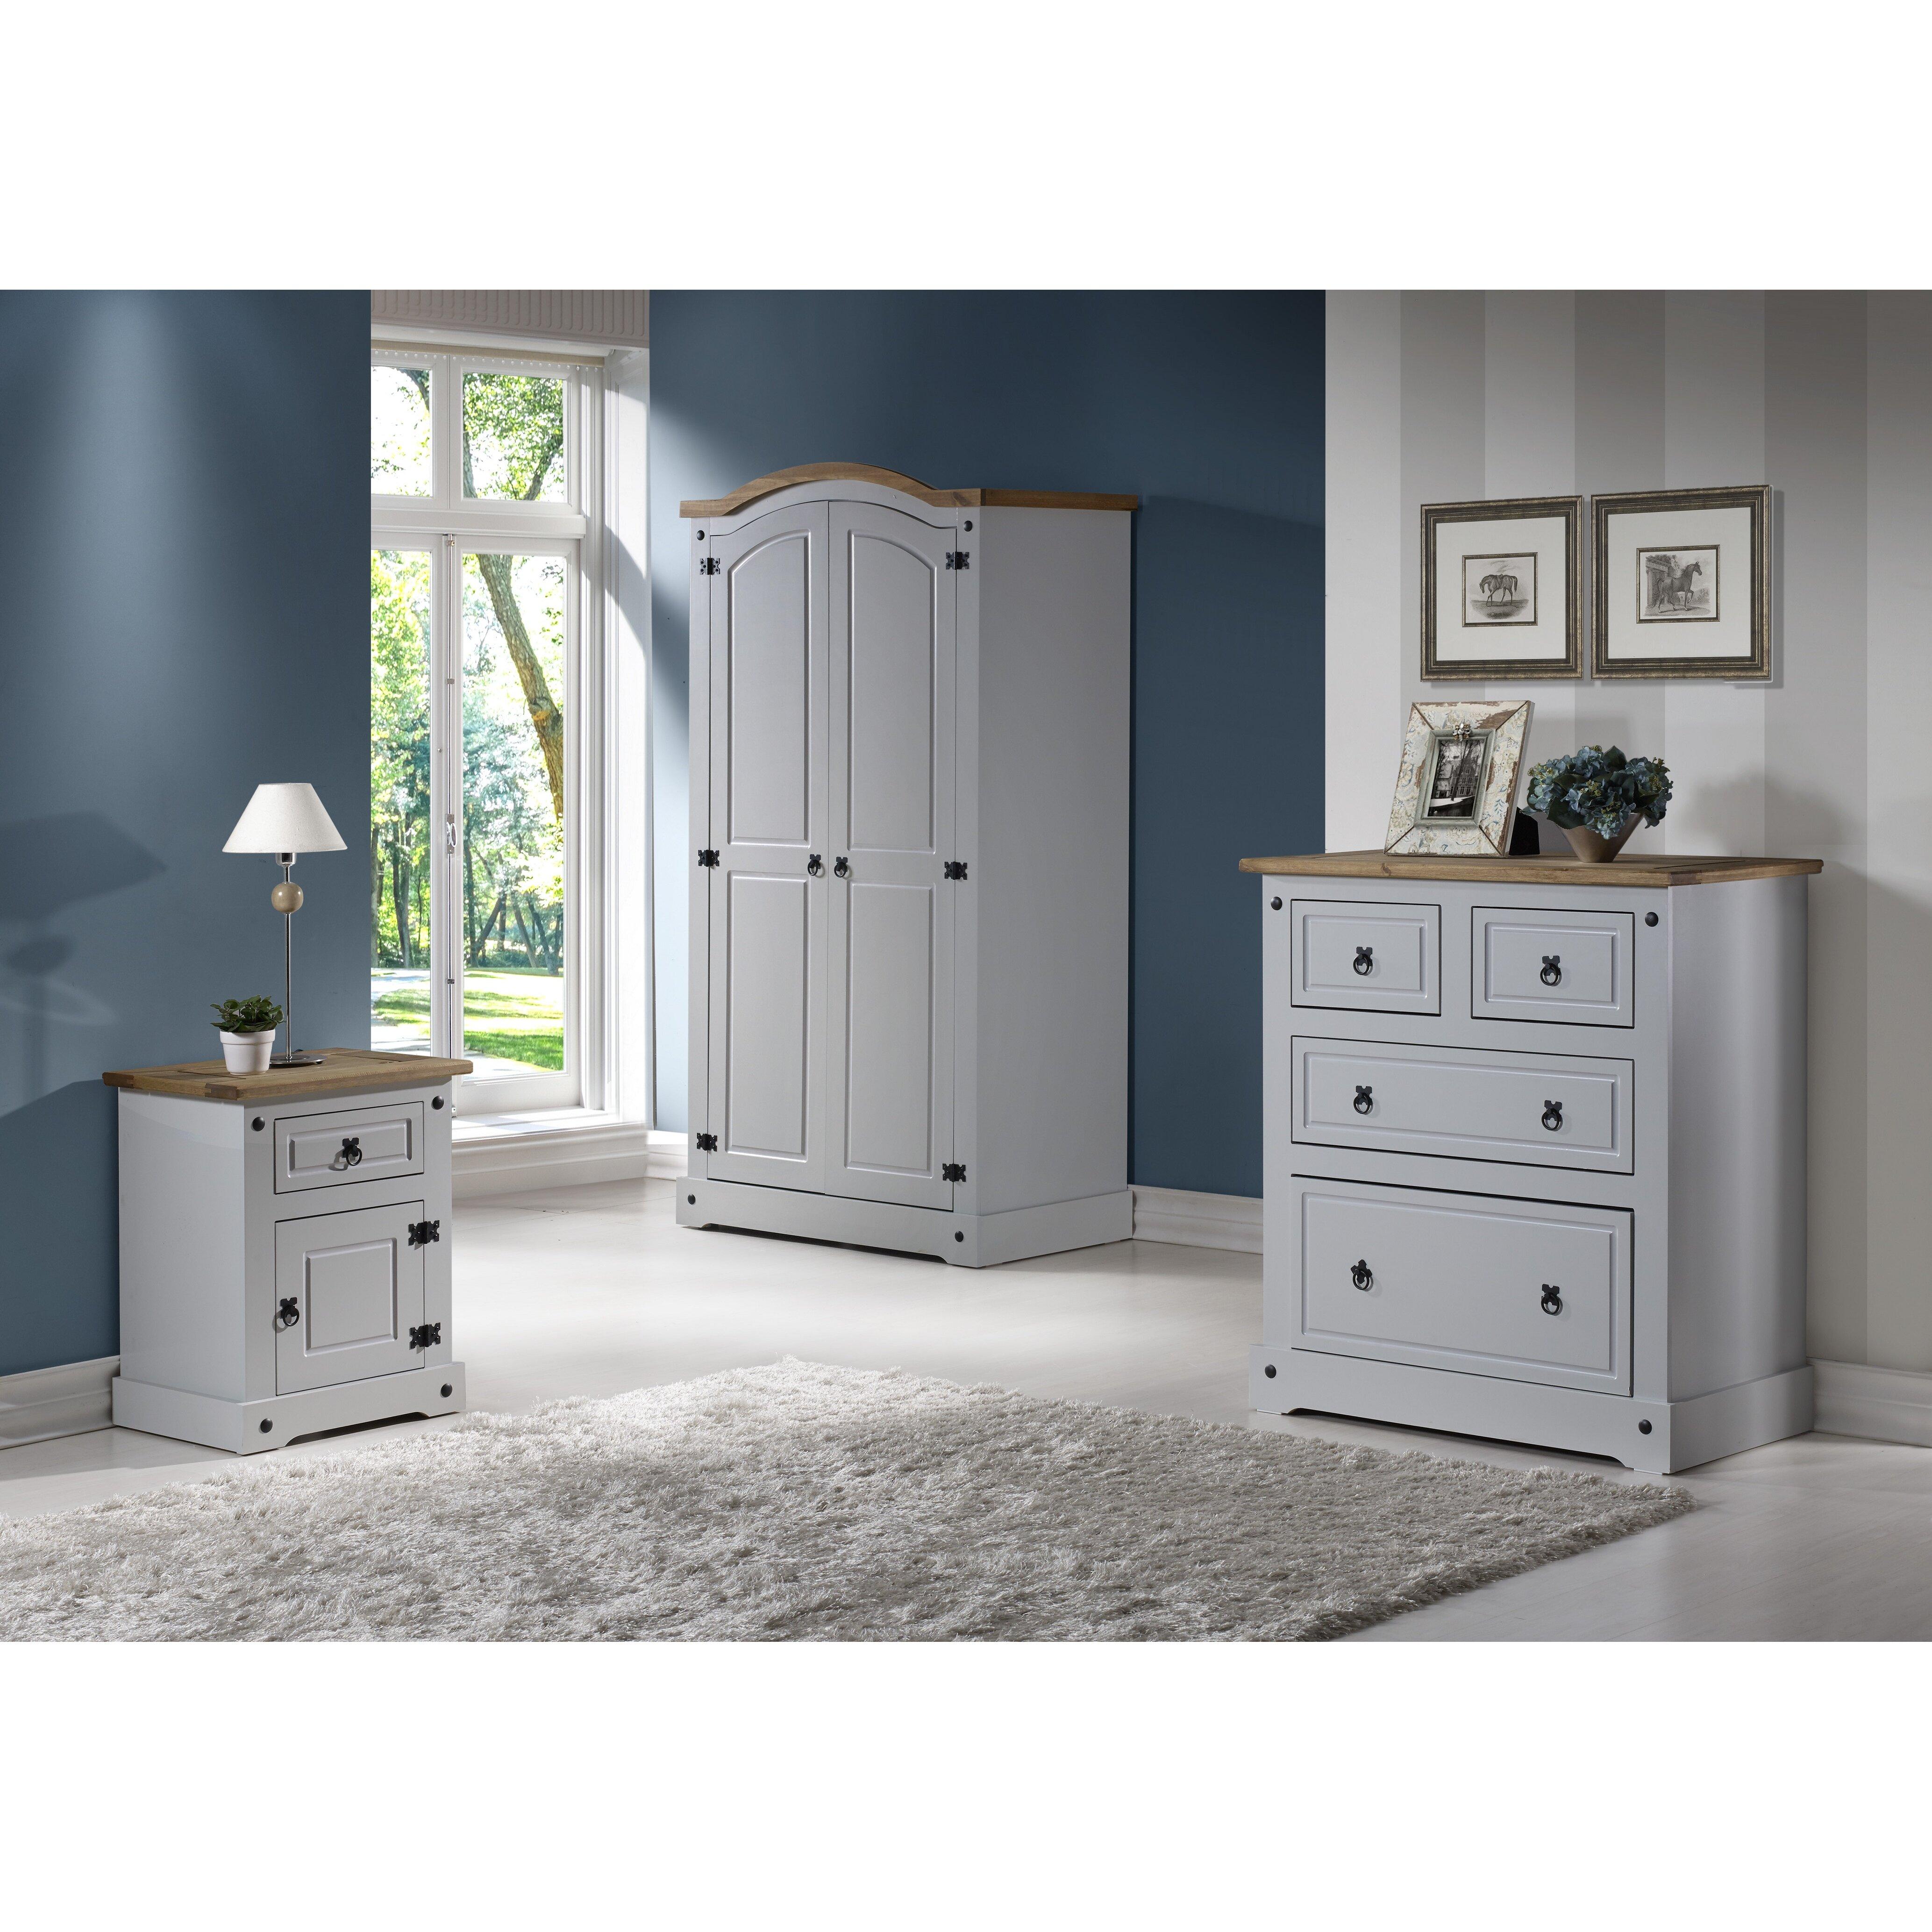 home loft concept corona 2 door wardrobe reviews wayfair uk. Black Bedroom Furniture Sets. Home Design Ideas